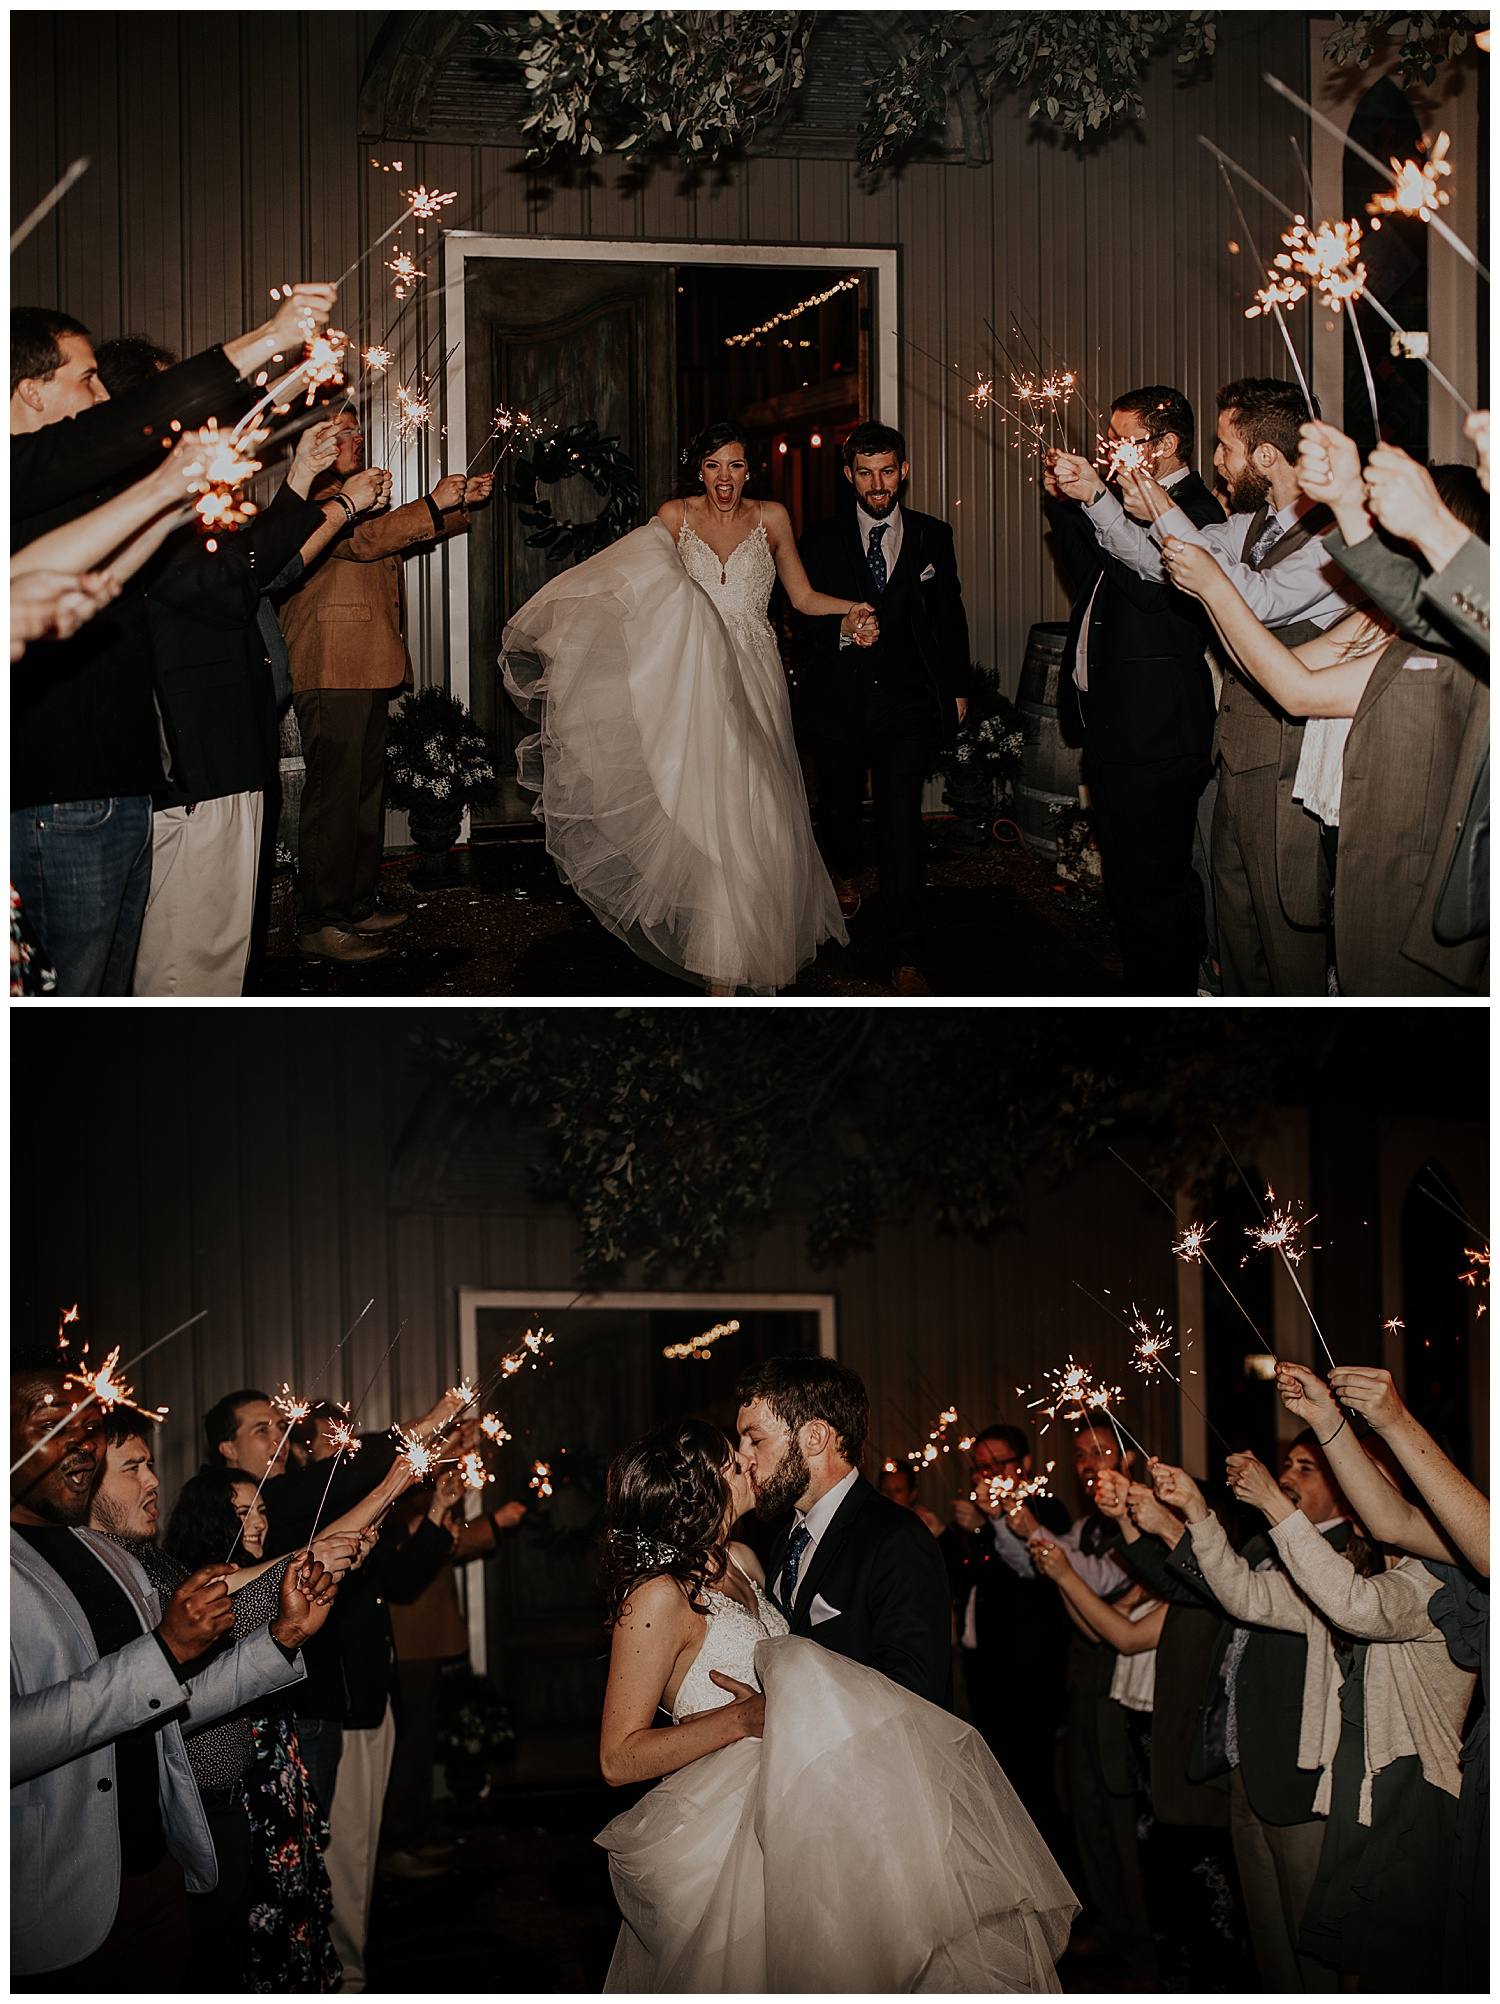 Laken-Mackenzie-Photography-Burge-Wedding-Stillwater-Meadow-Aledo-Texas-Dallas-Fort-Worth-Wedding-Photographer29.jpg